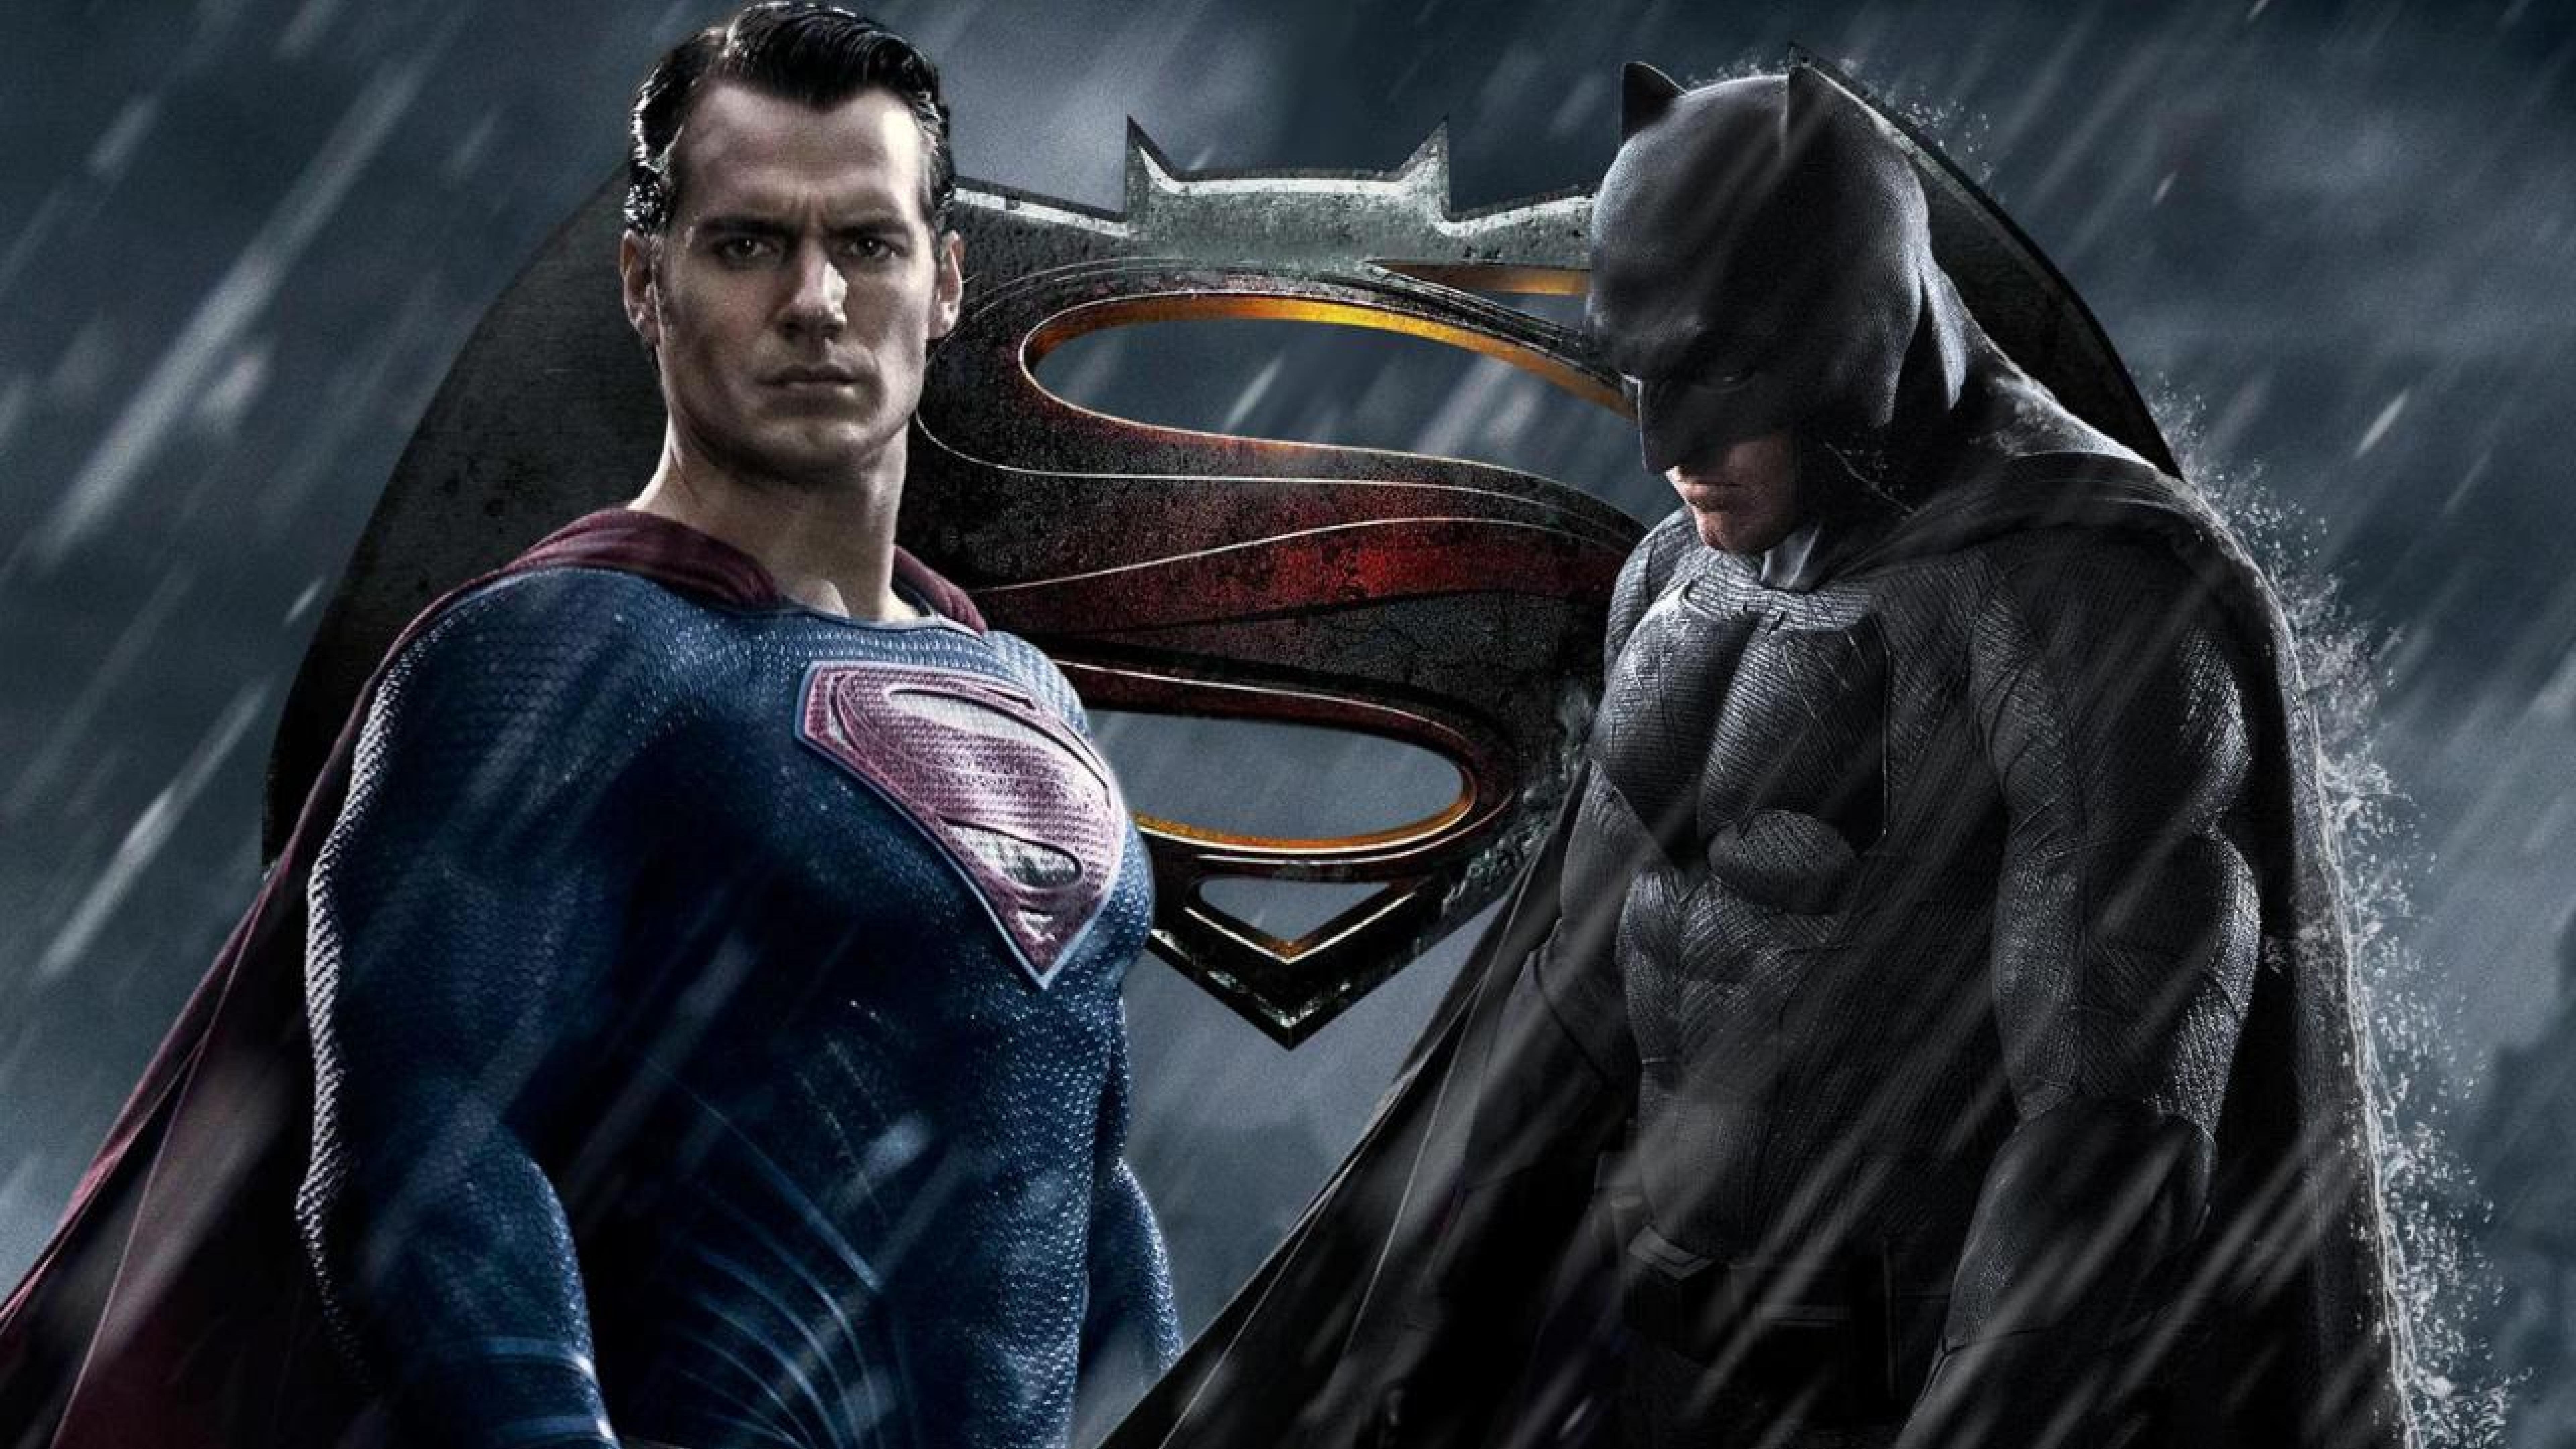 7680x4320 Batman Vs Superman Wallpaper 8k Wallpaper Hd Movies 4k